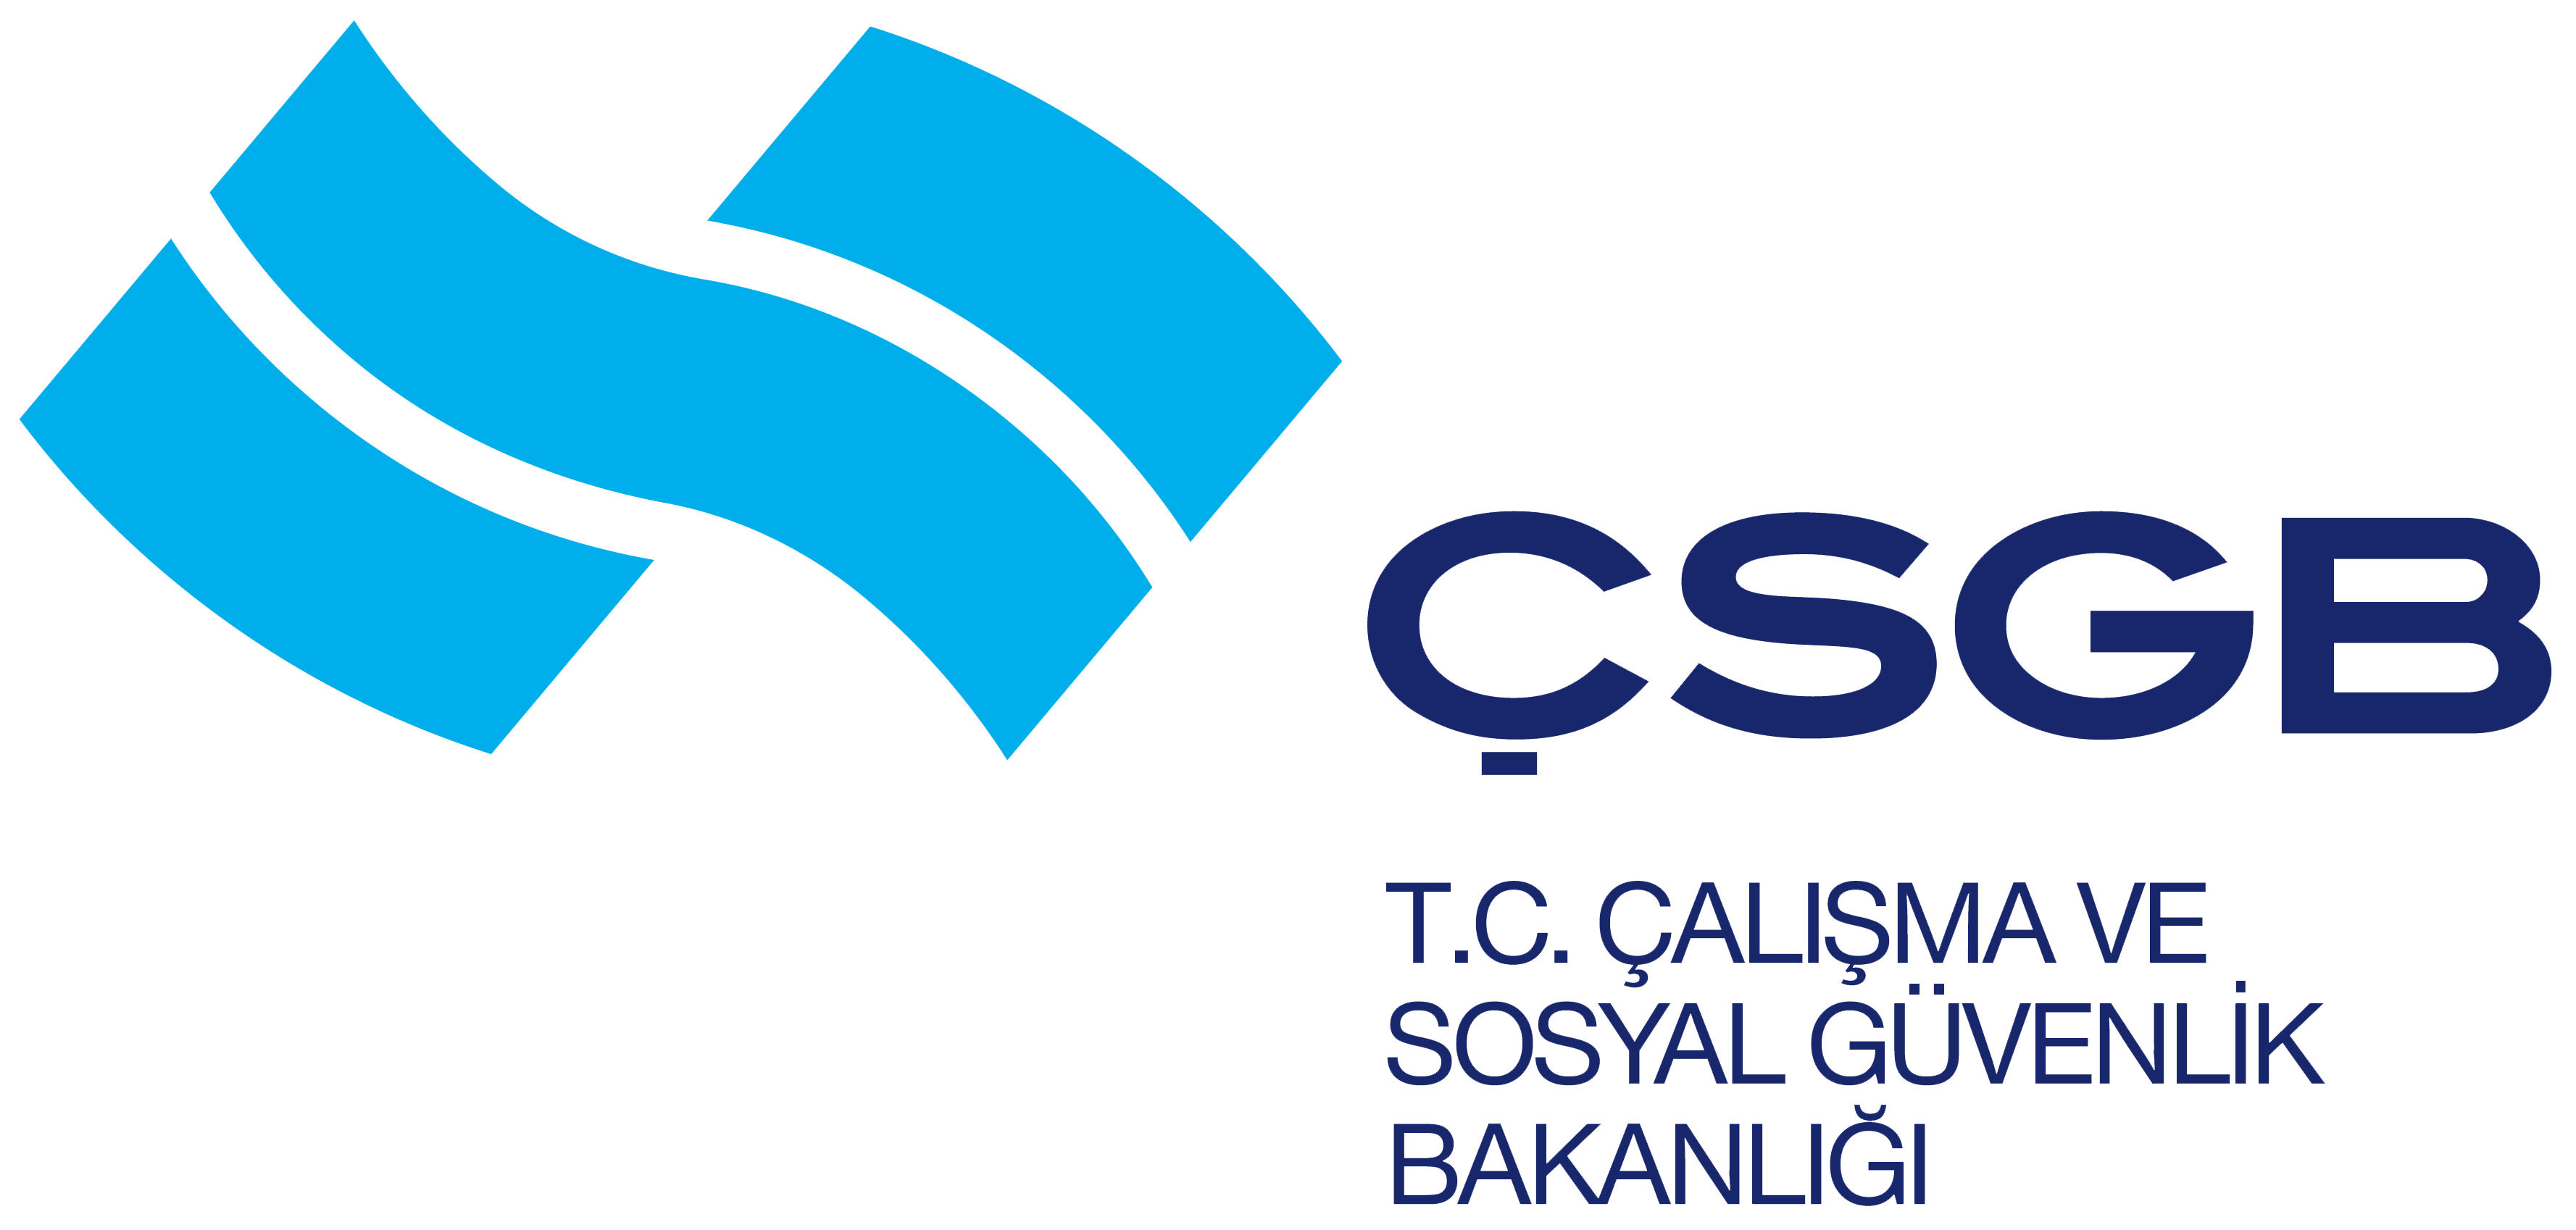 ÇSGB – T.C. Çalışma ve Sosyal Güvenlik Bakanlığı Logosu [csgb.gov.tr] png